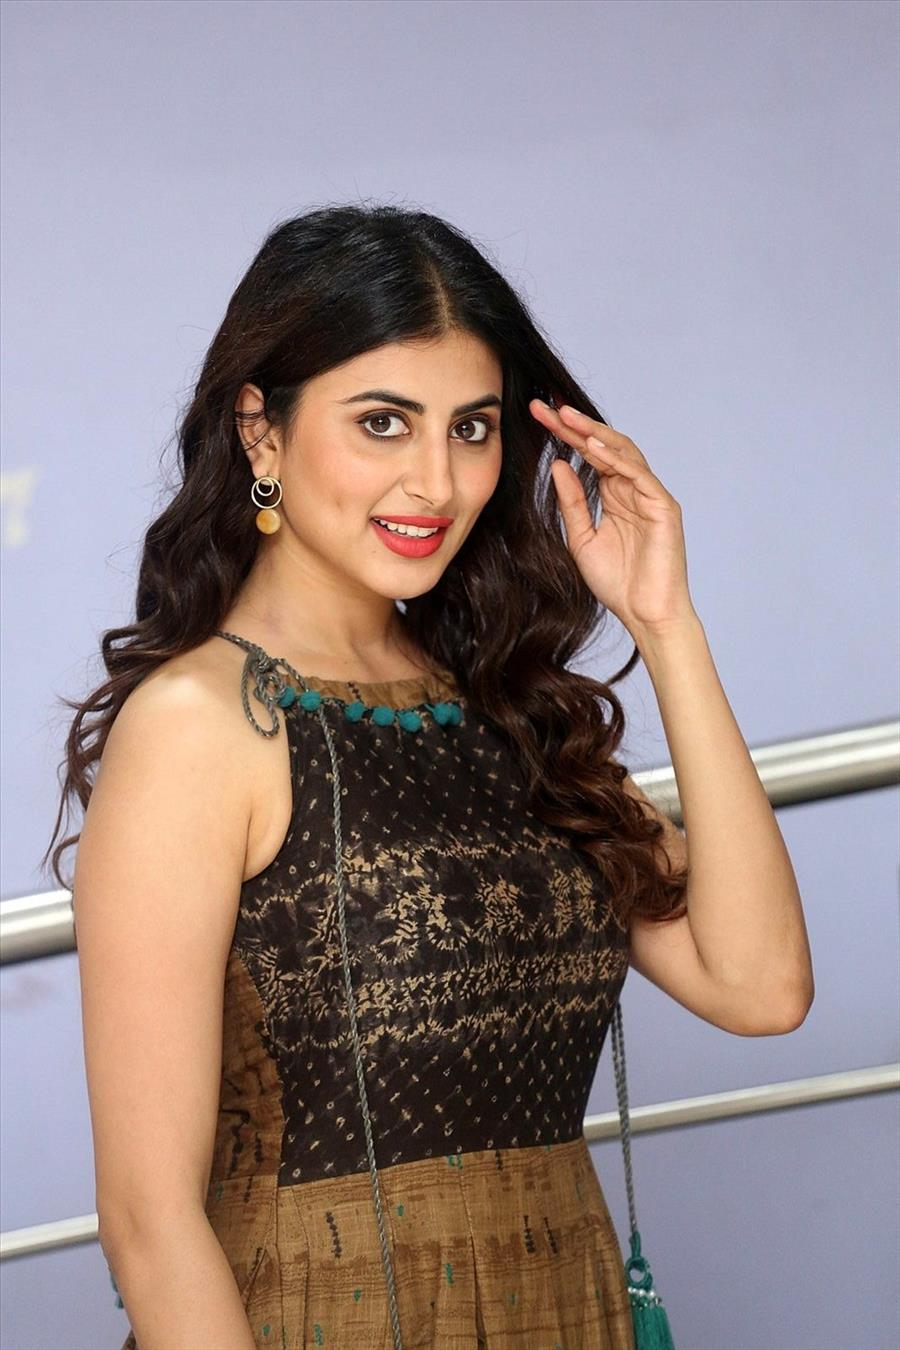 Indian Girl Shweta Avasthi at Malli Malli Chusa Movie Trailer Launch